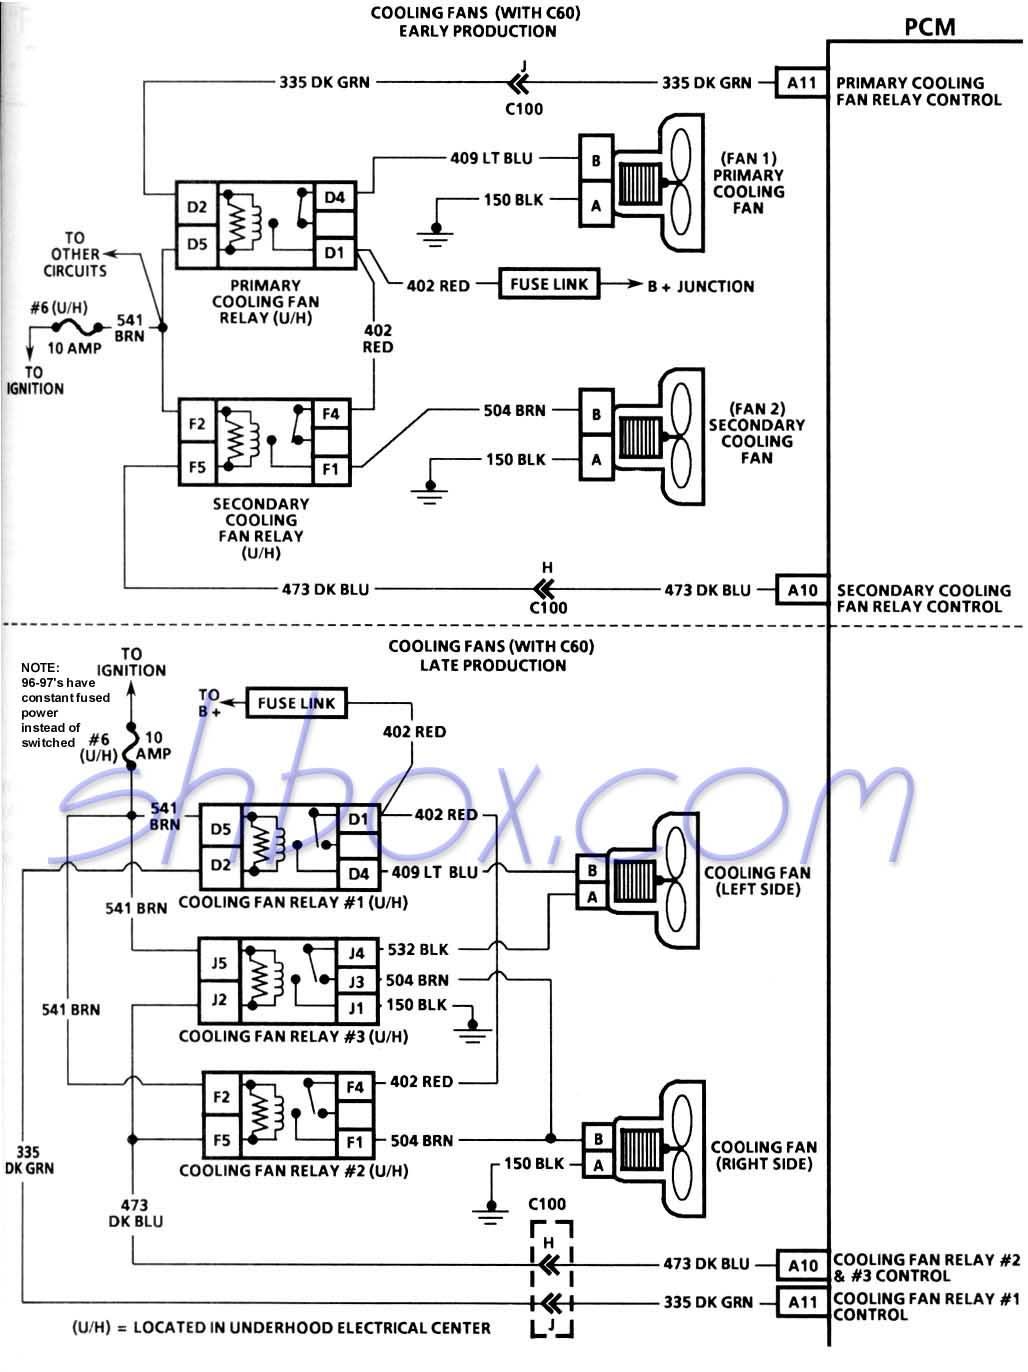 cushman turf truckster wiring diagram: cushman titan wiring diagram -  efcaviation com,design